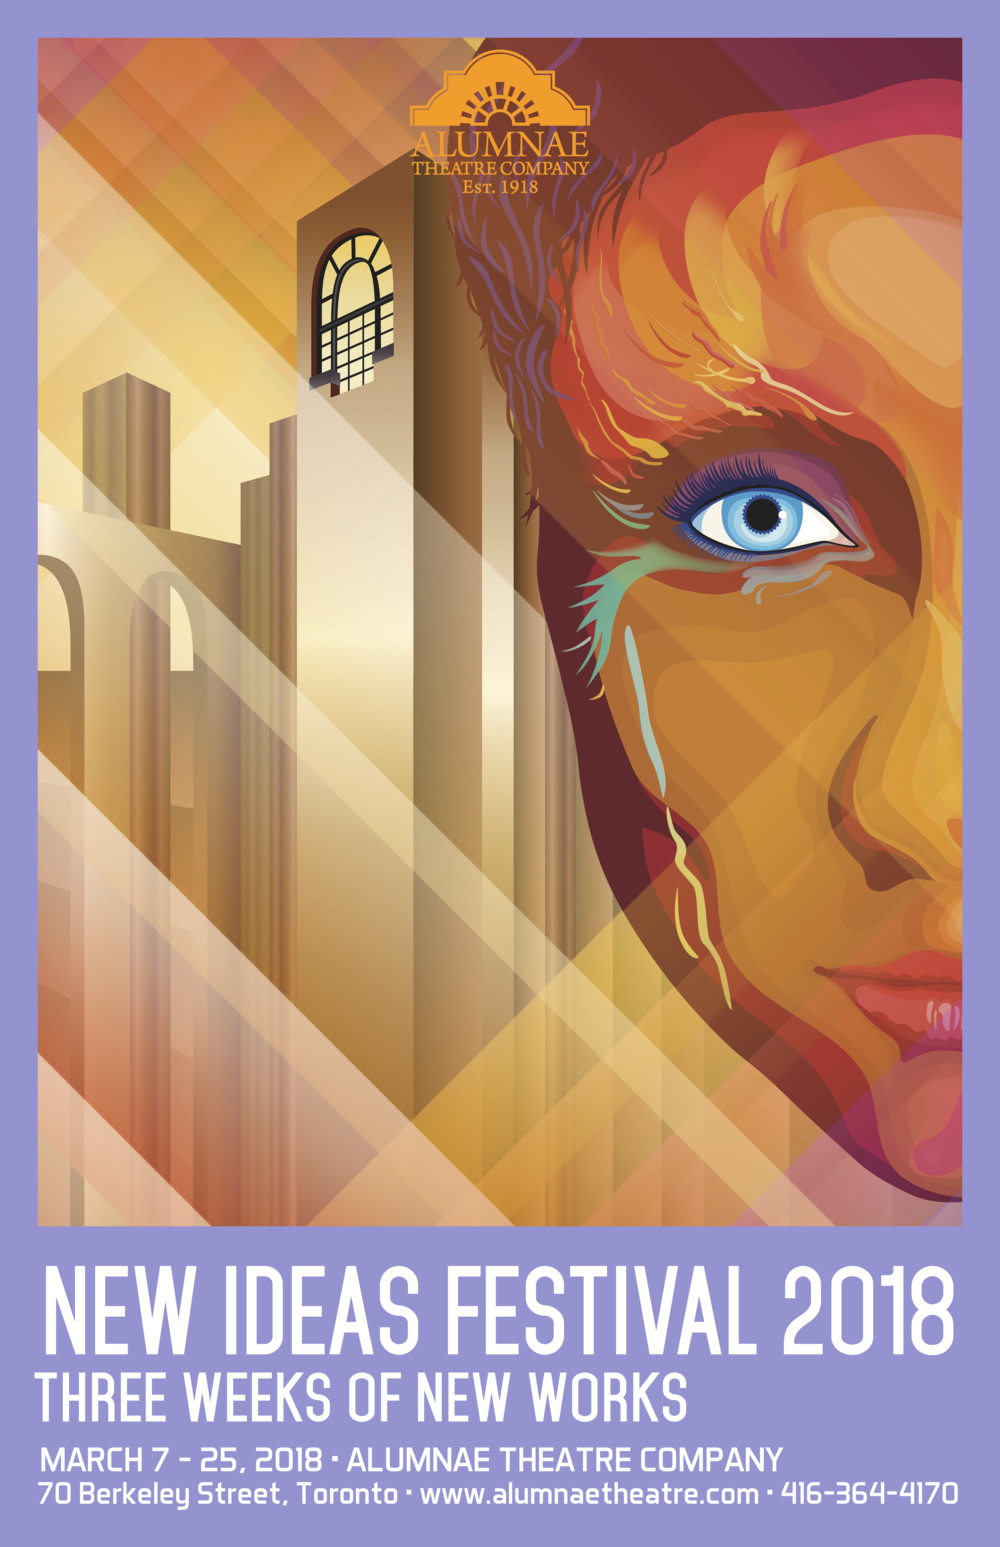 New Ideas Festival — Alumnae Theatre